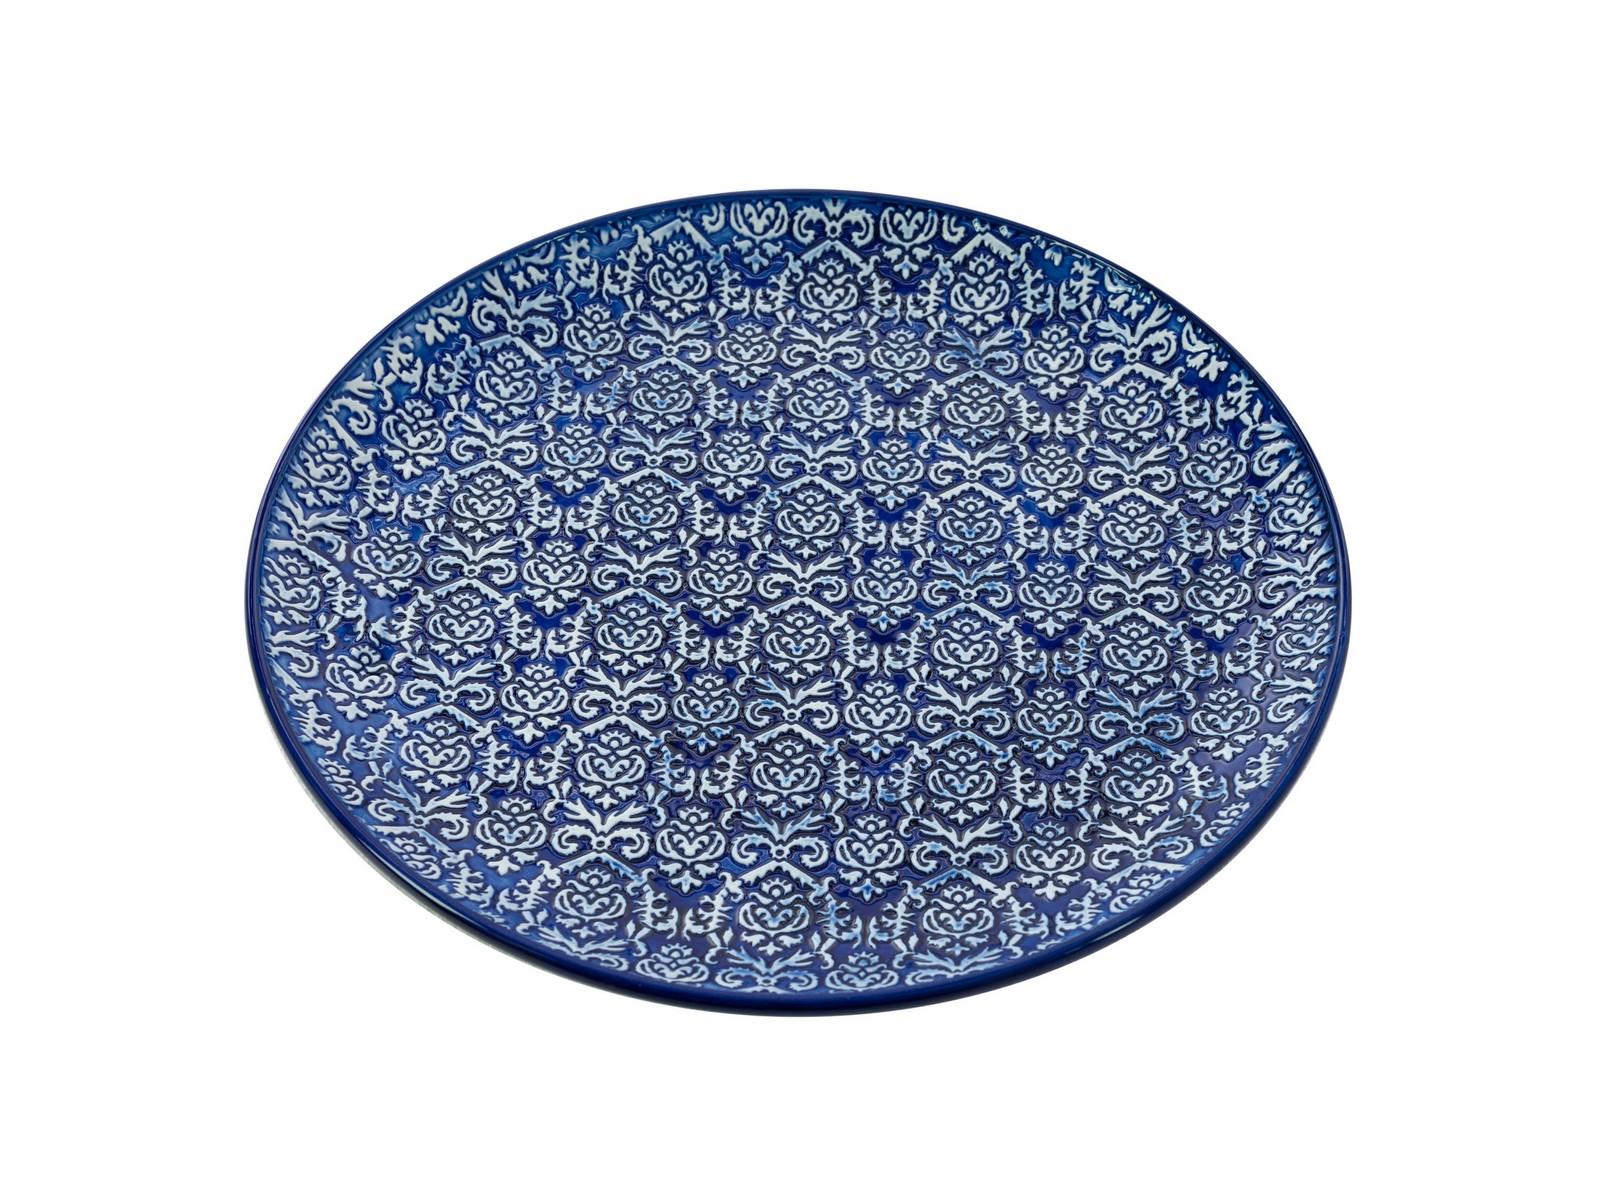 Блюдо SydneyДекоративные блюда<br><br><br>Material: Керамика<br>Height см: 3<br>Diameter см: 33